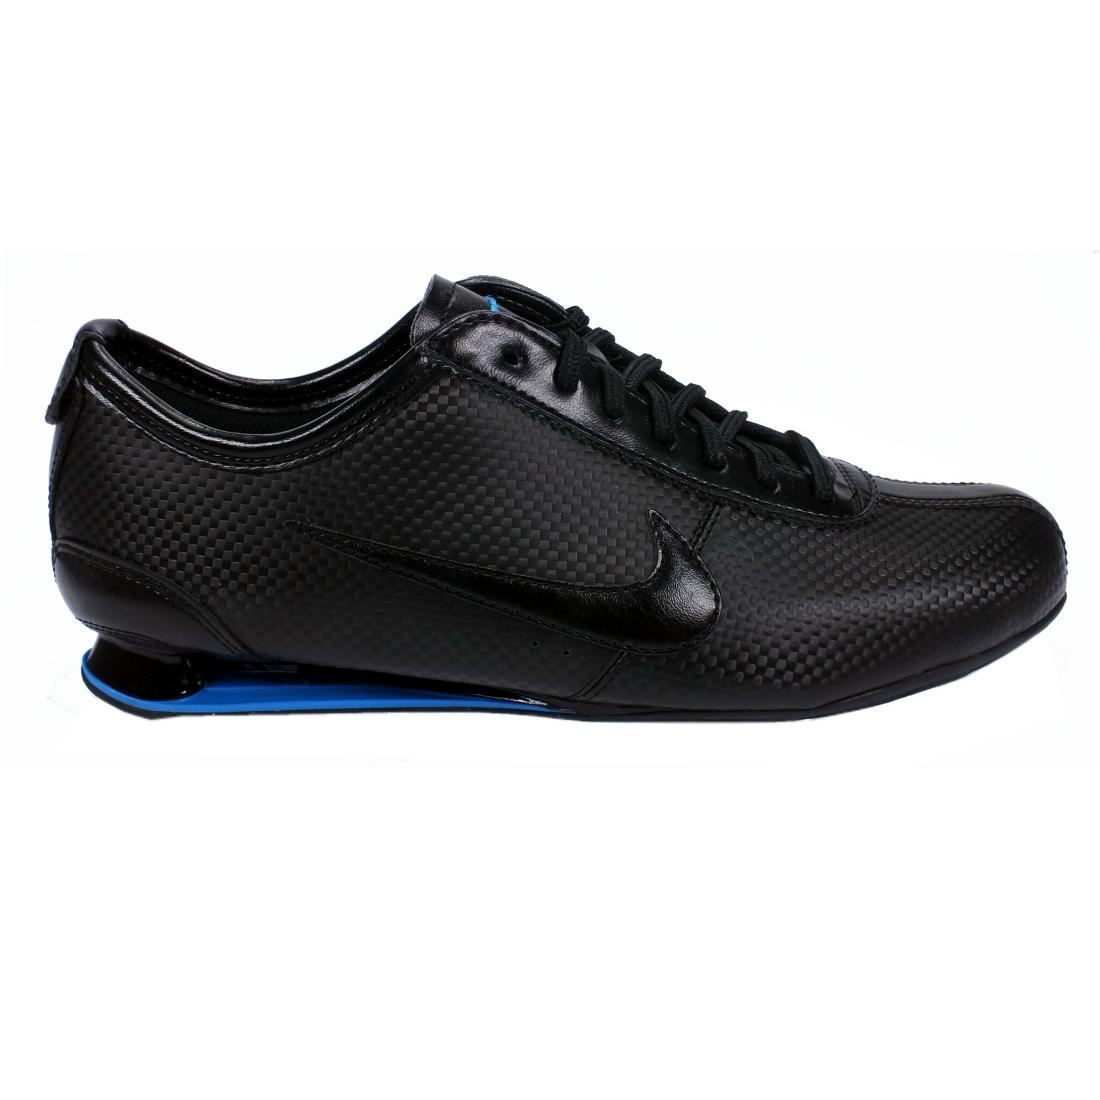 watch ef9cc 2860c nike shox rivalry black herren schuhe turnschuhe sneakers - Nike Shox  Rivalry Schwarz